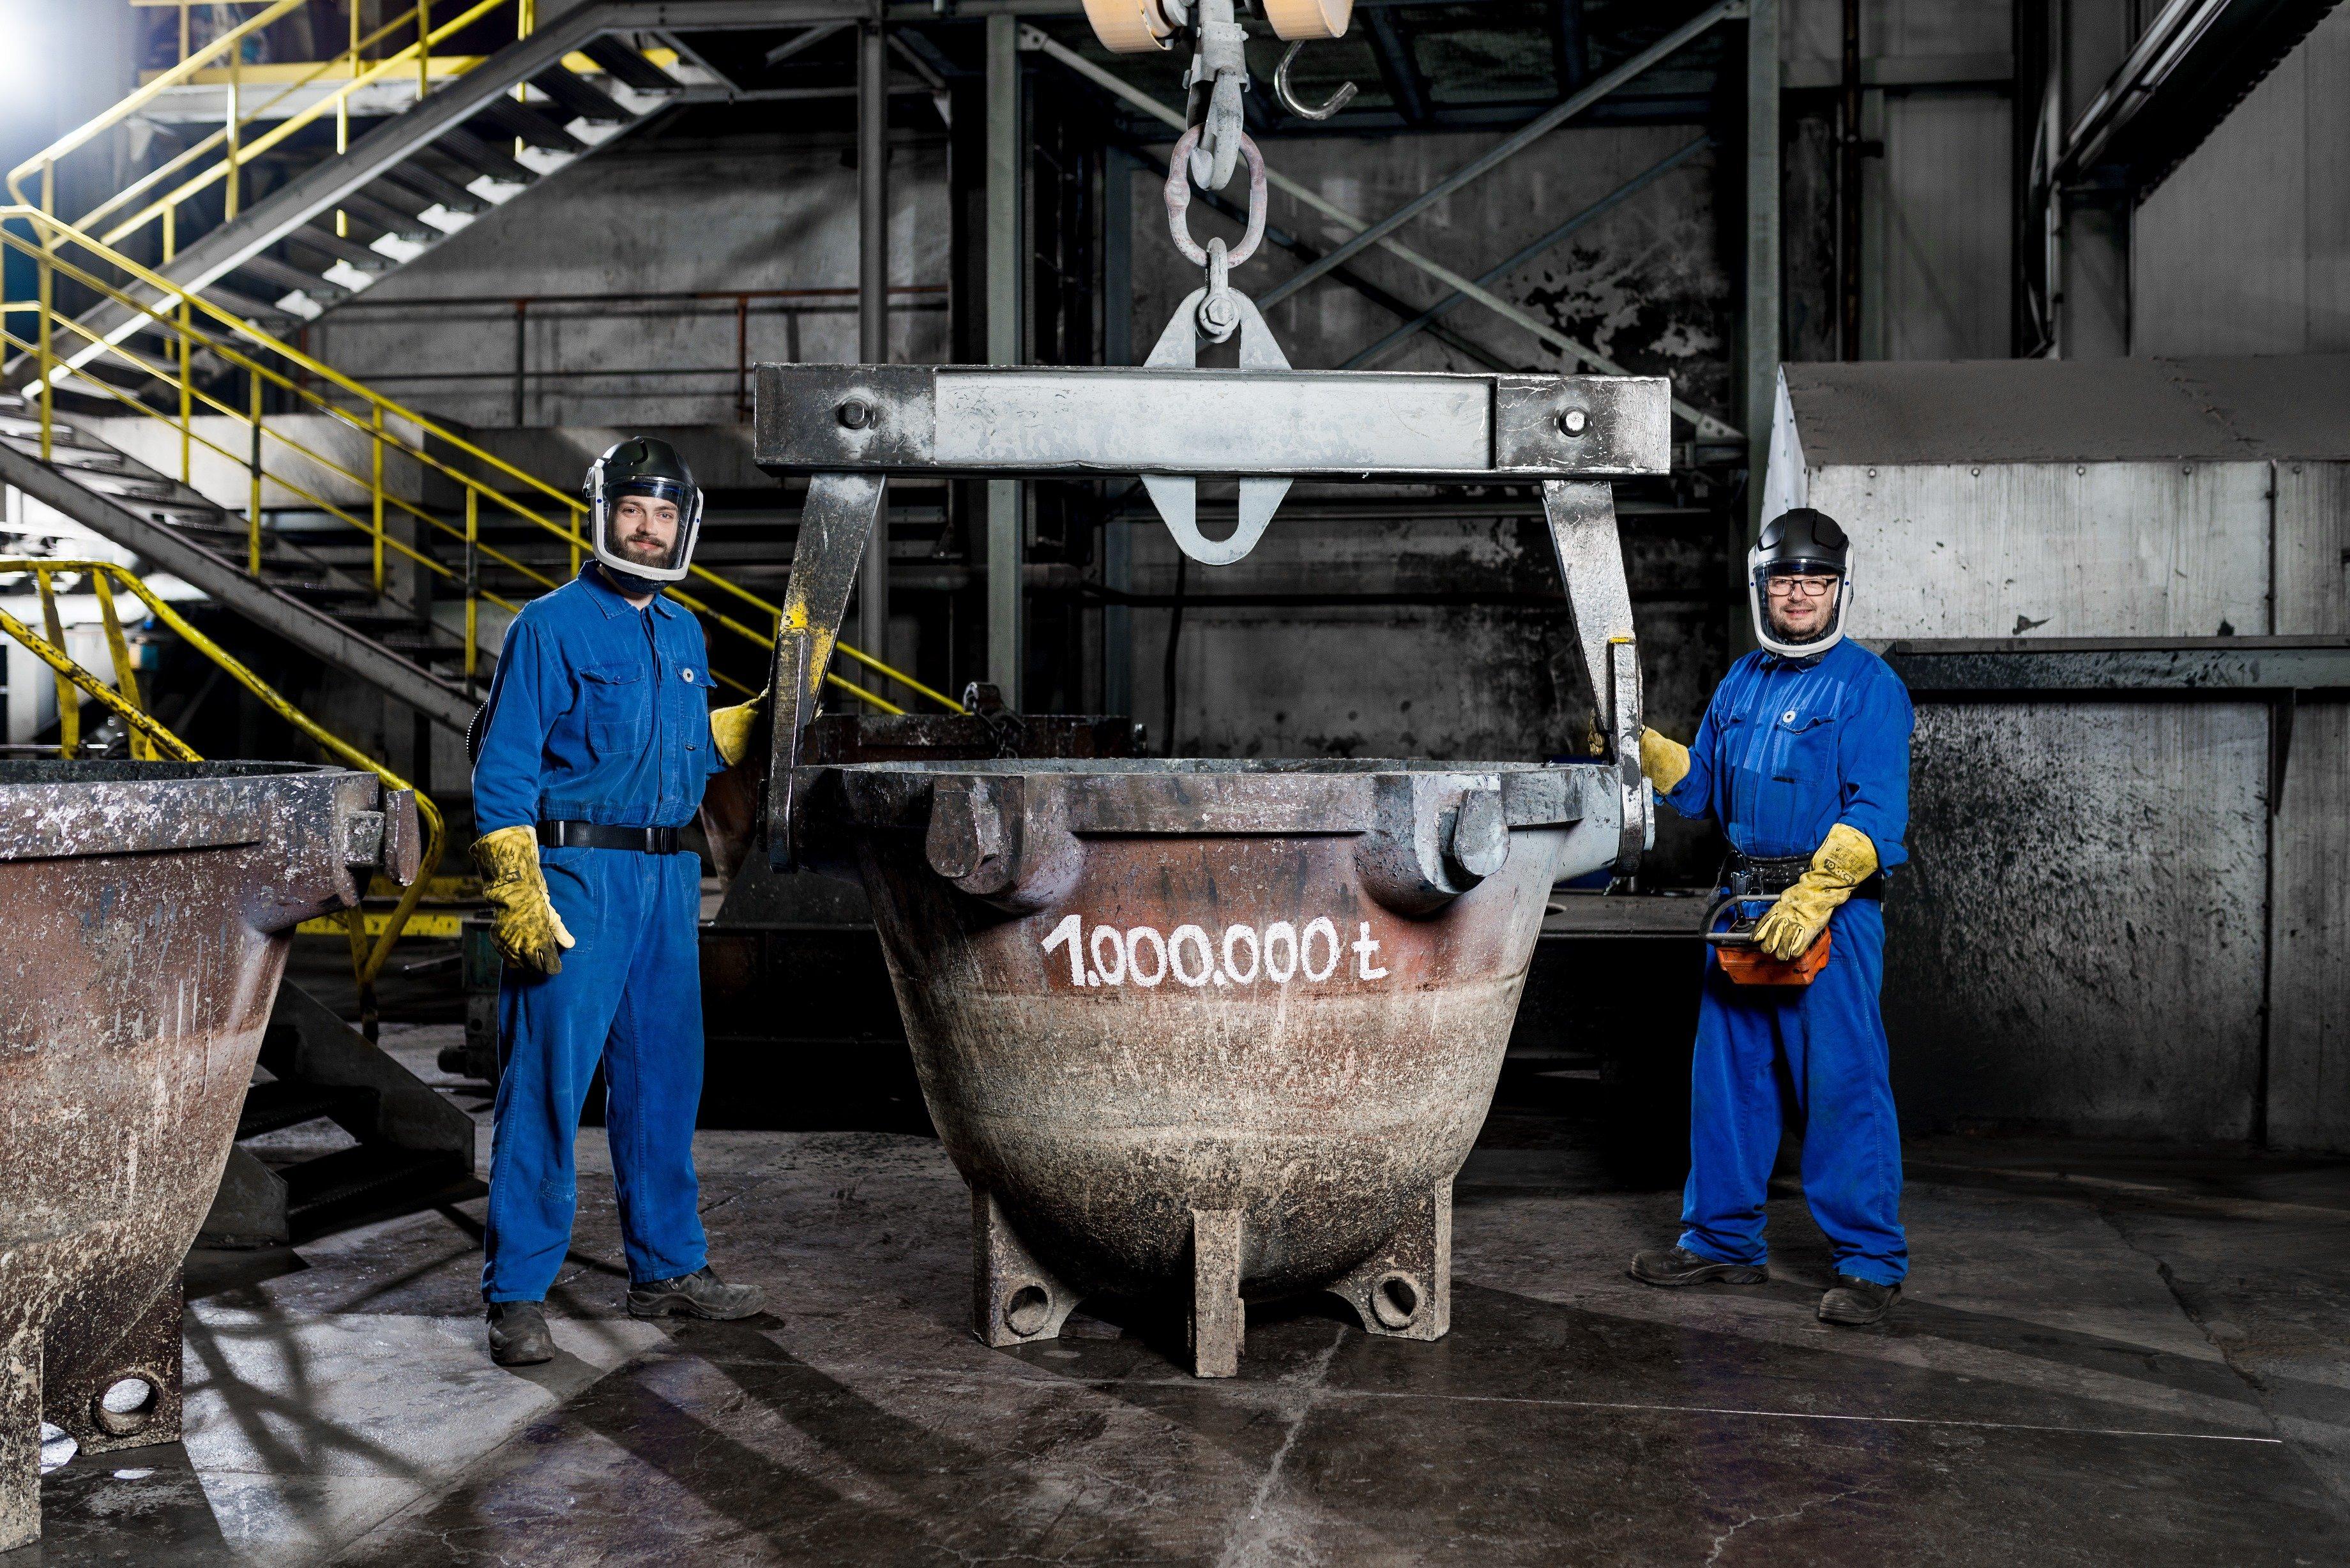 Foto: Ecobat Technologies